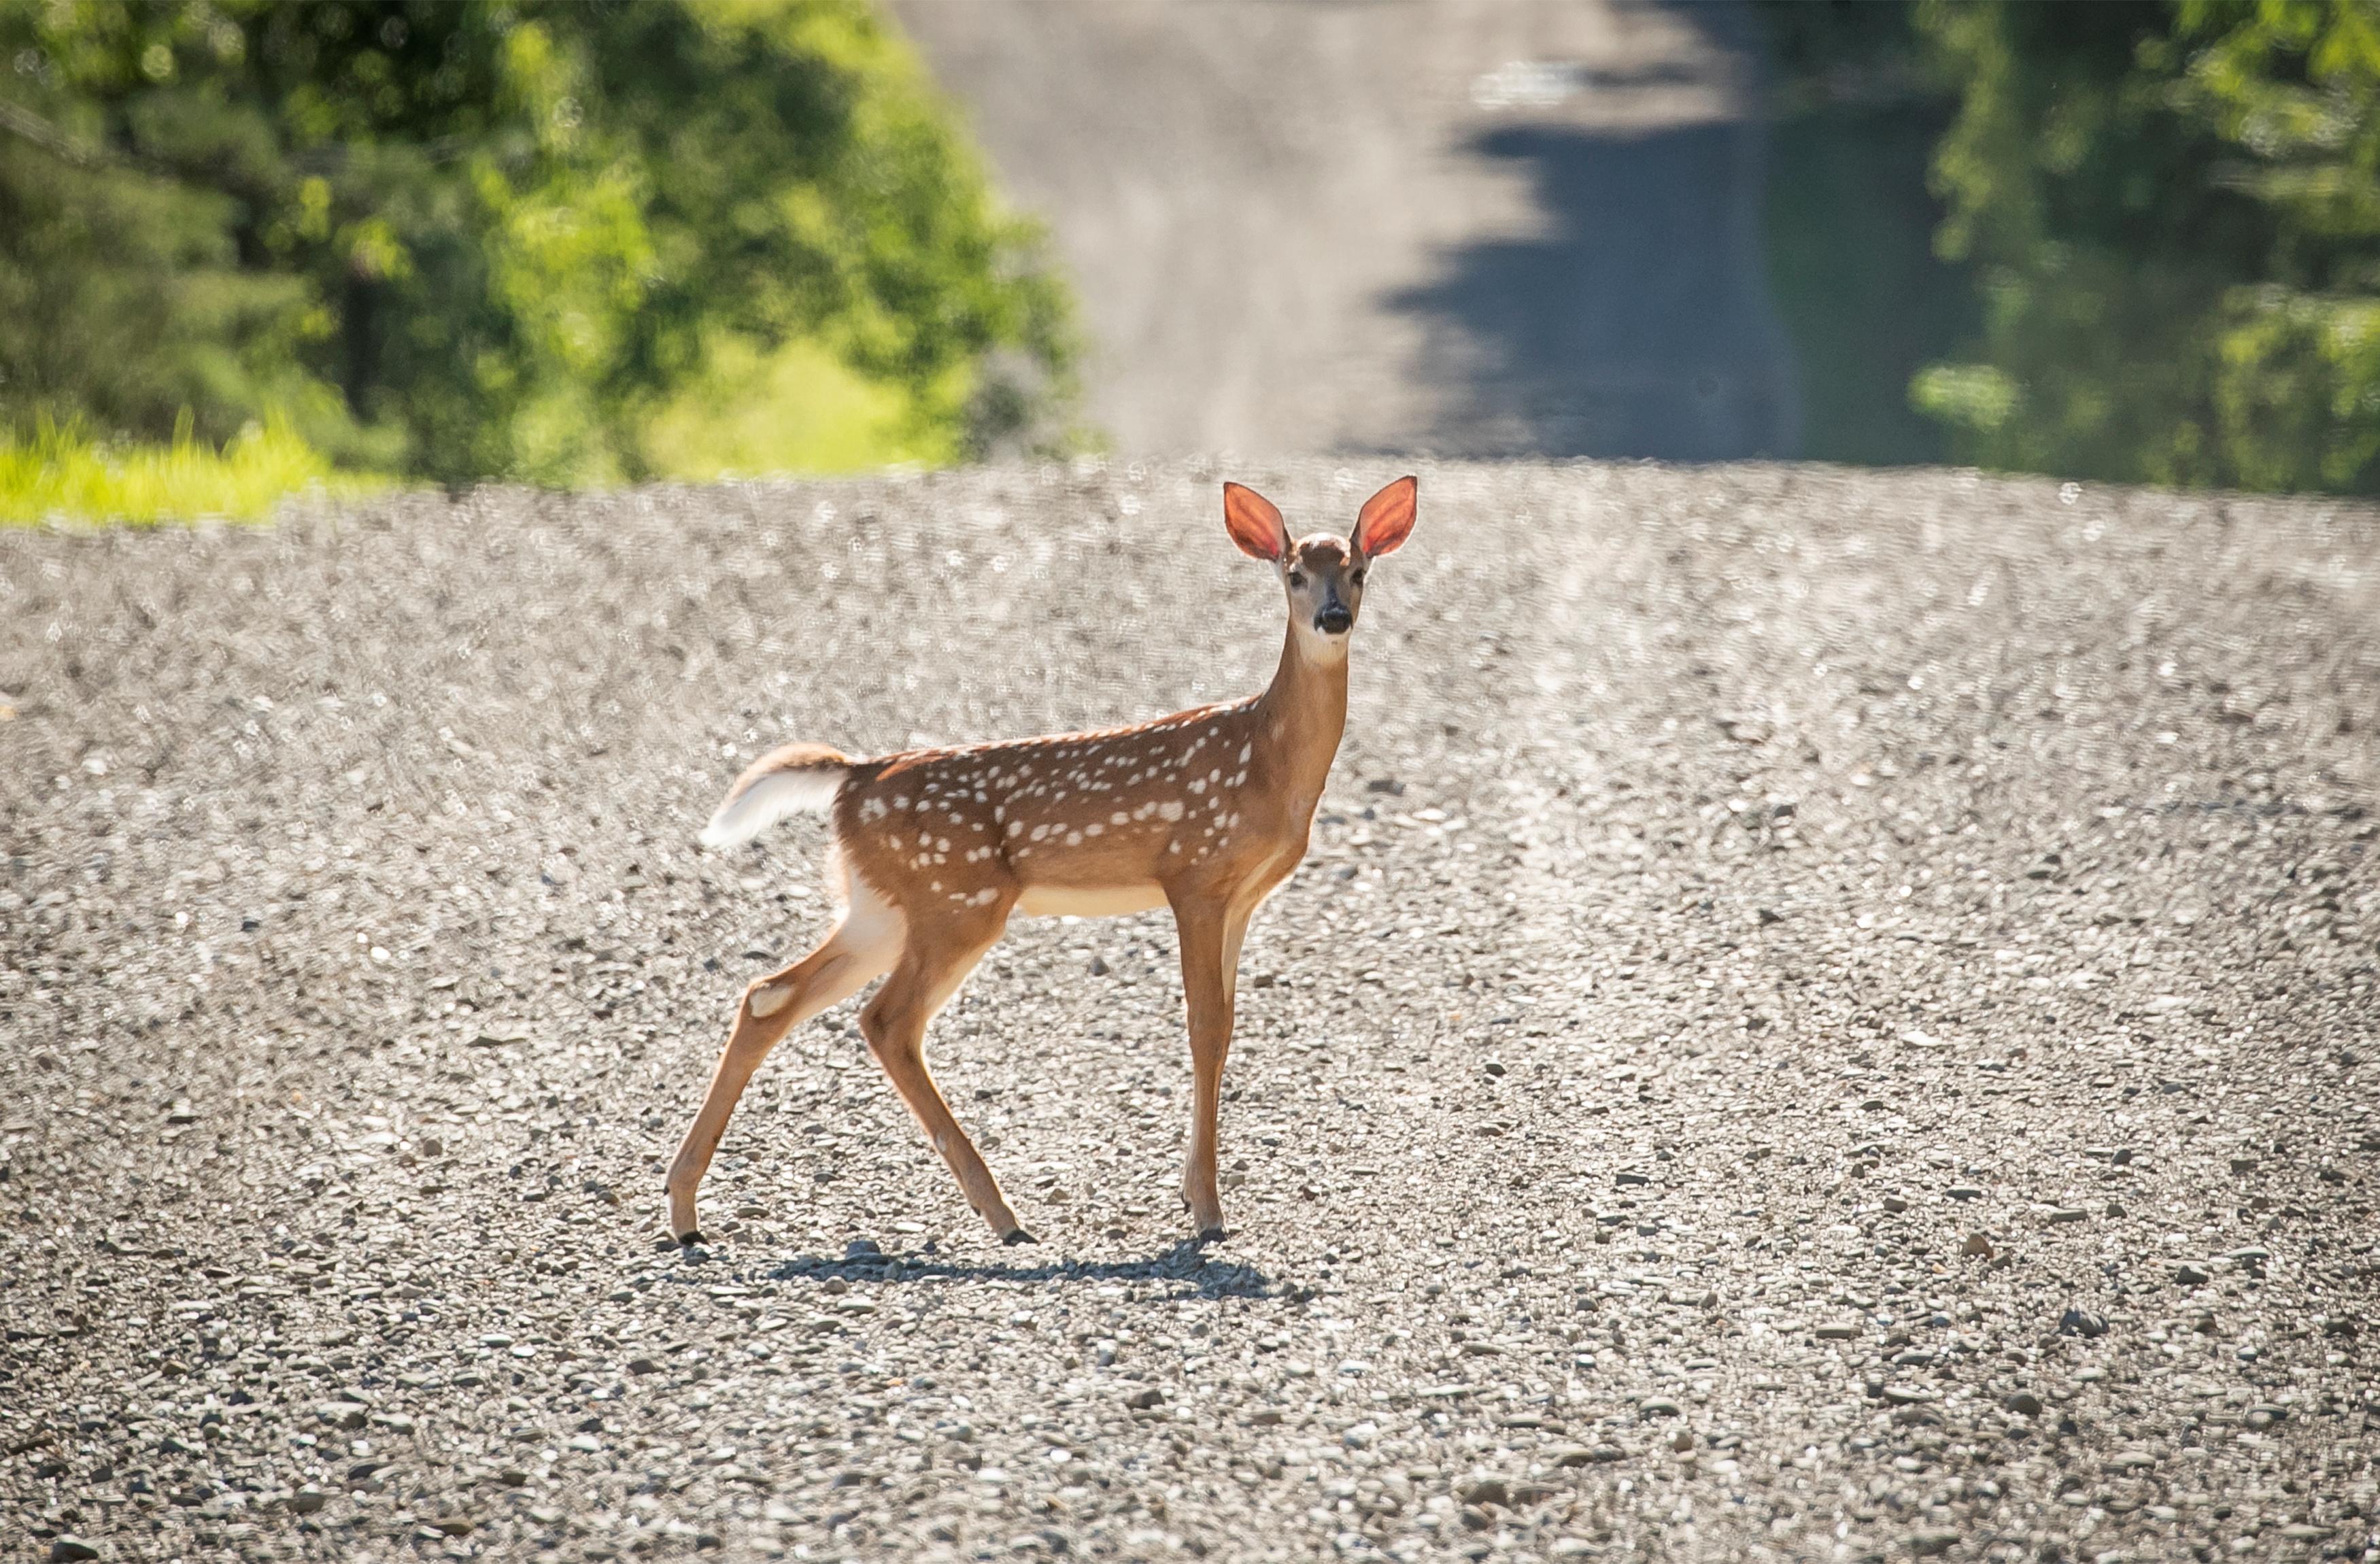 A deer crosses a dirt road in New Albion, New York, U.S. July 20, 2020. Picture taken July 20, 2020. REUTERS/Brendan McDermid/File Photo